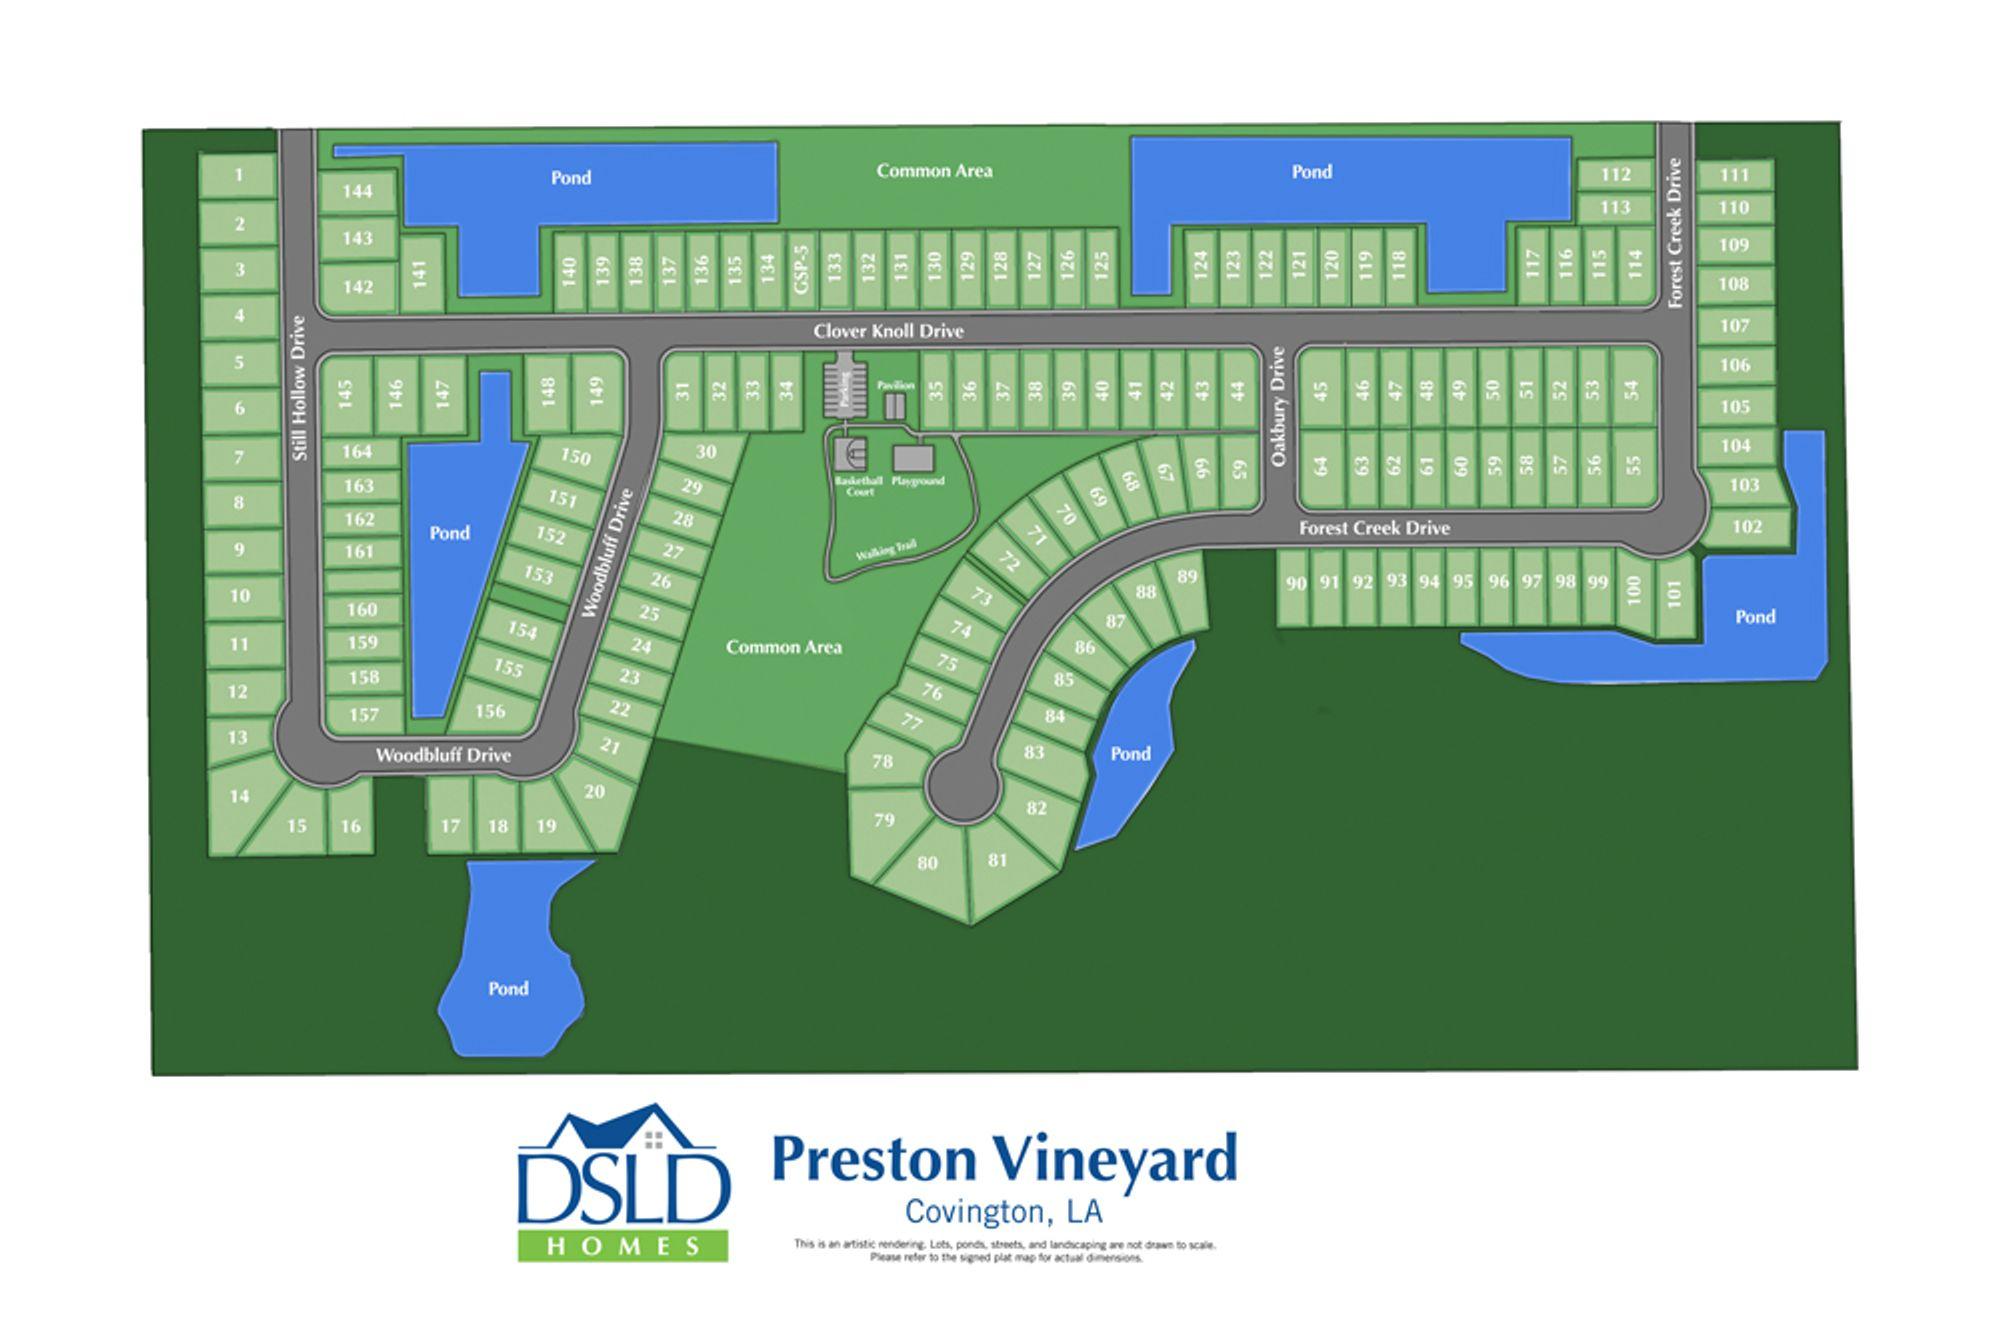 Preston Vineyard